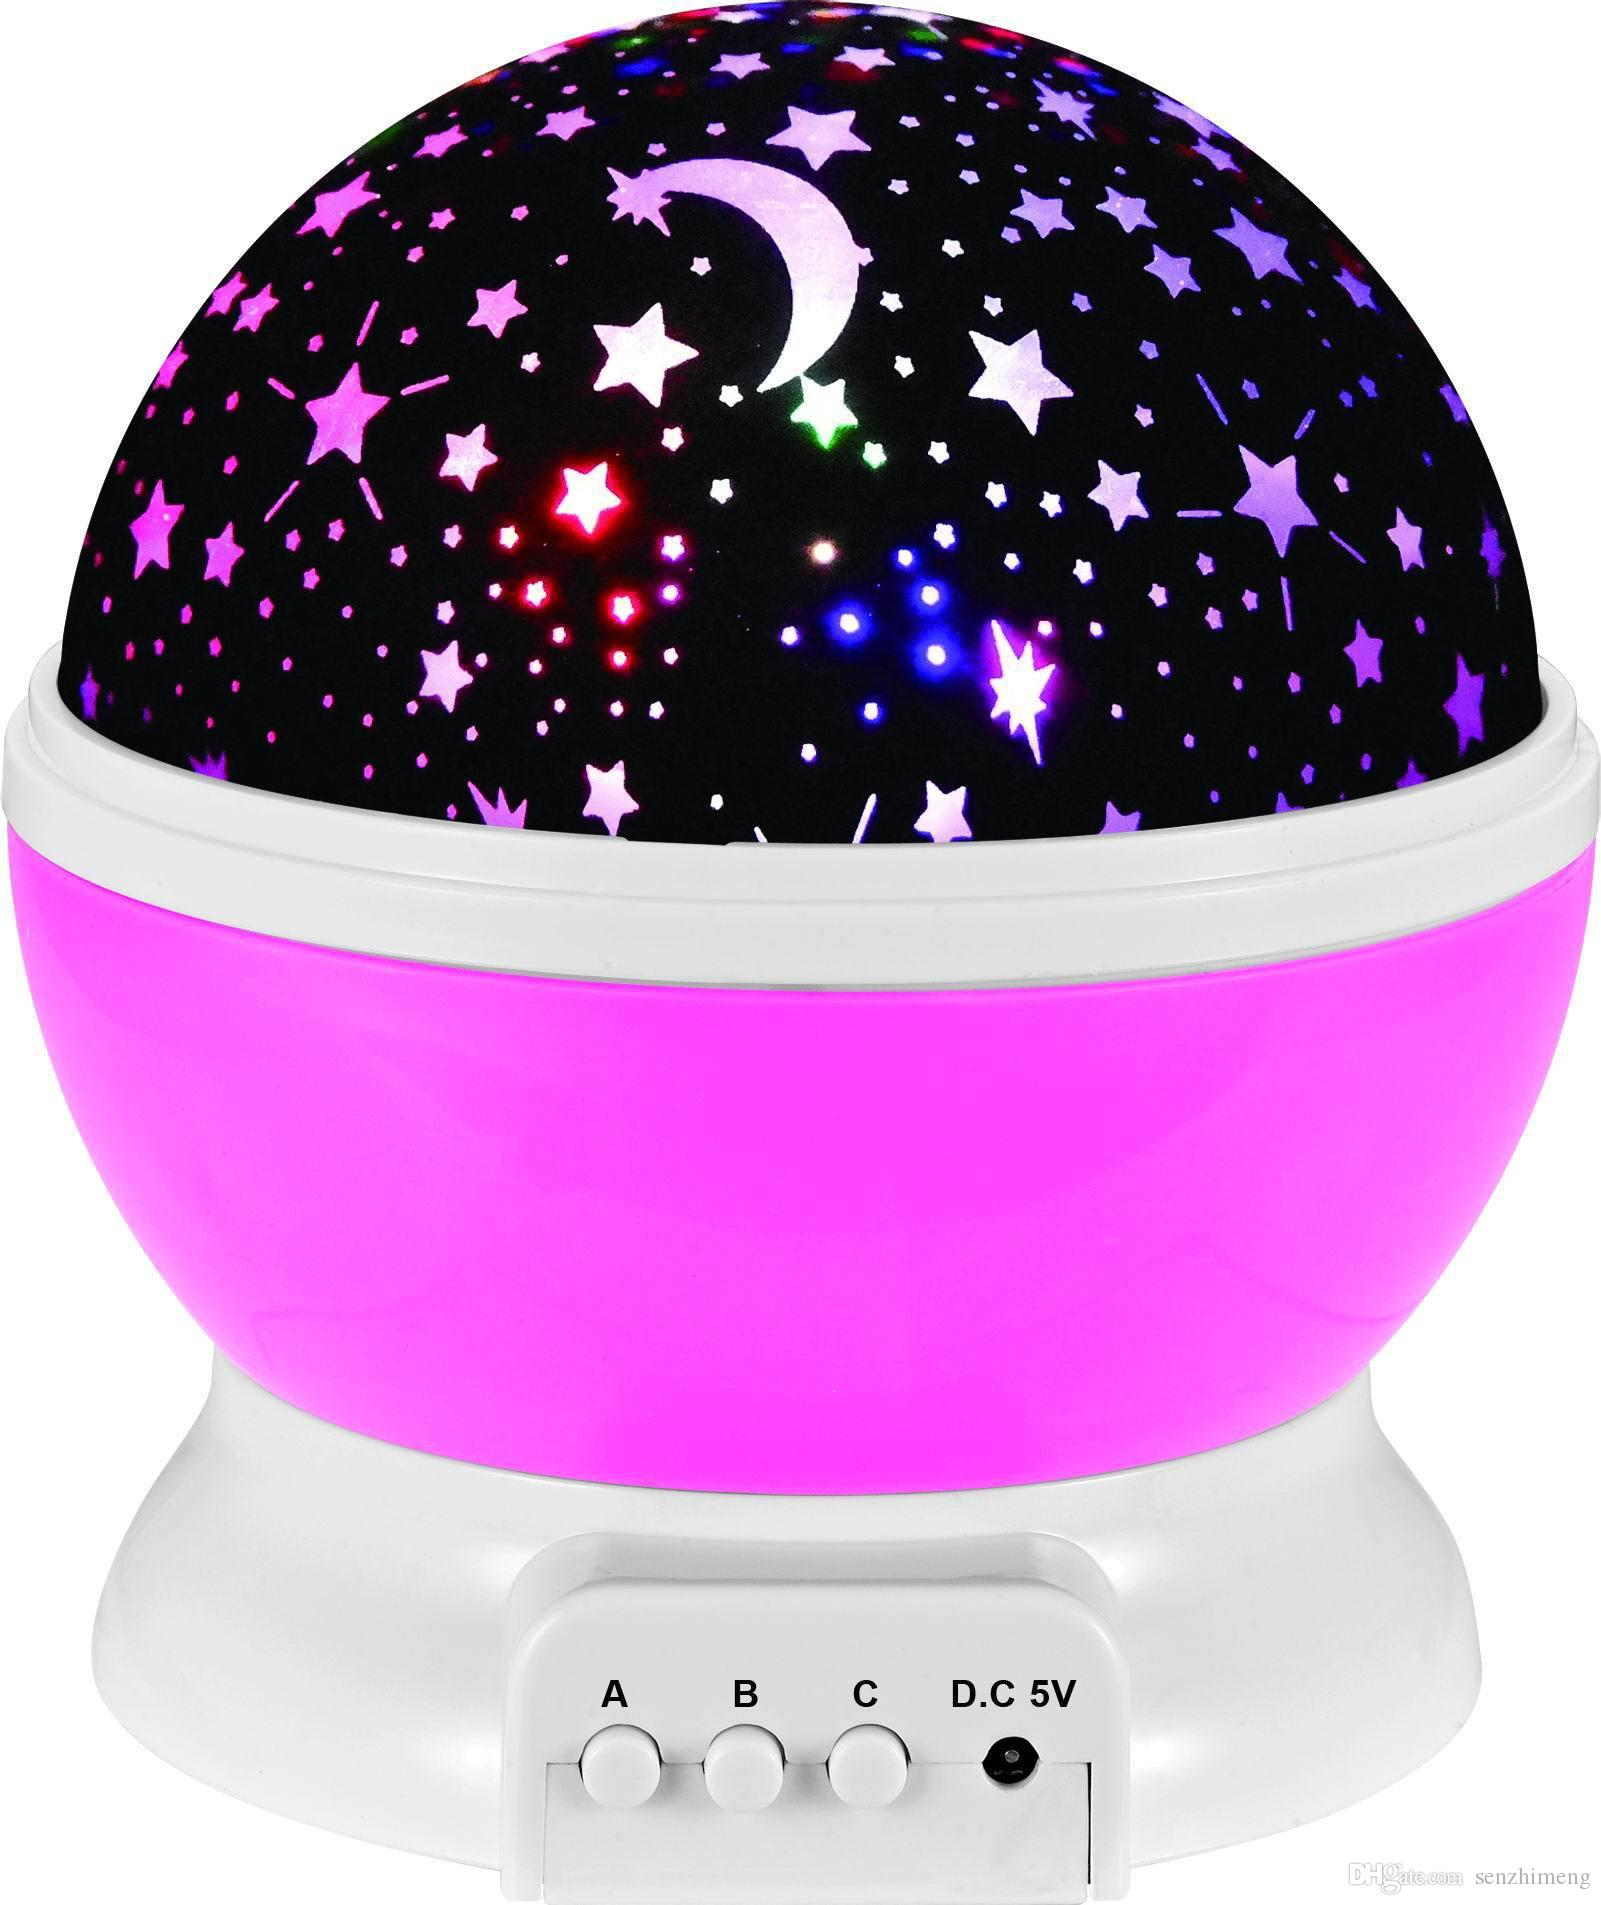 ful Starlight Вращающийся мечты Романтика Globe Starlight Starlight Projection Lamp USB Connection Батарея Праздничный свет Пасха.